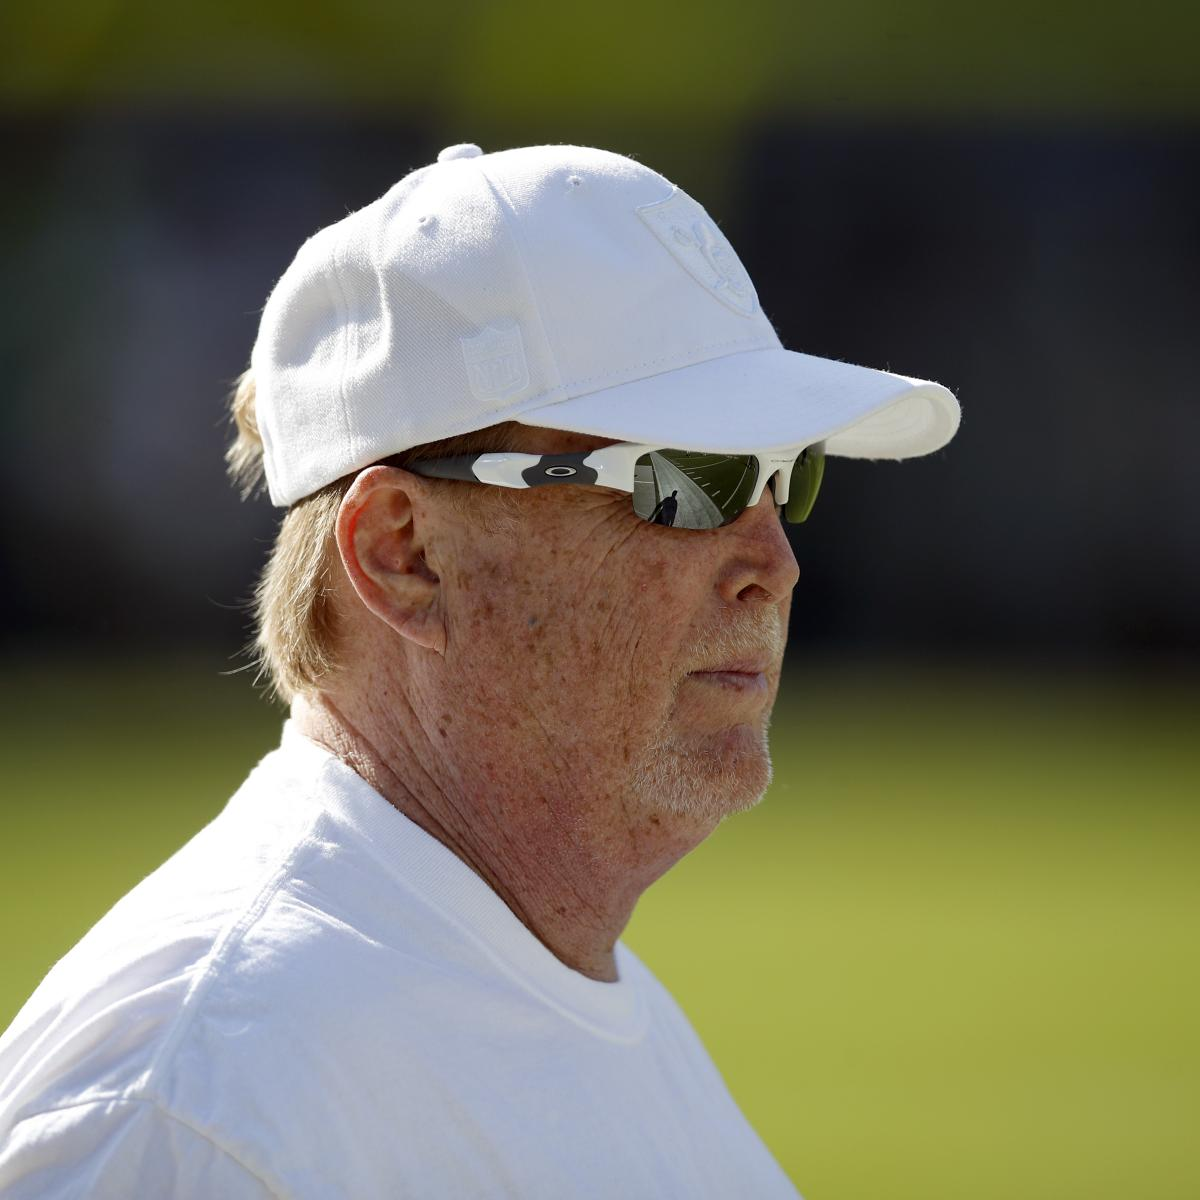 Raiders Owner Mark Davis Takes Responsibility for 'I Can Breathe' Tweet thumbnail